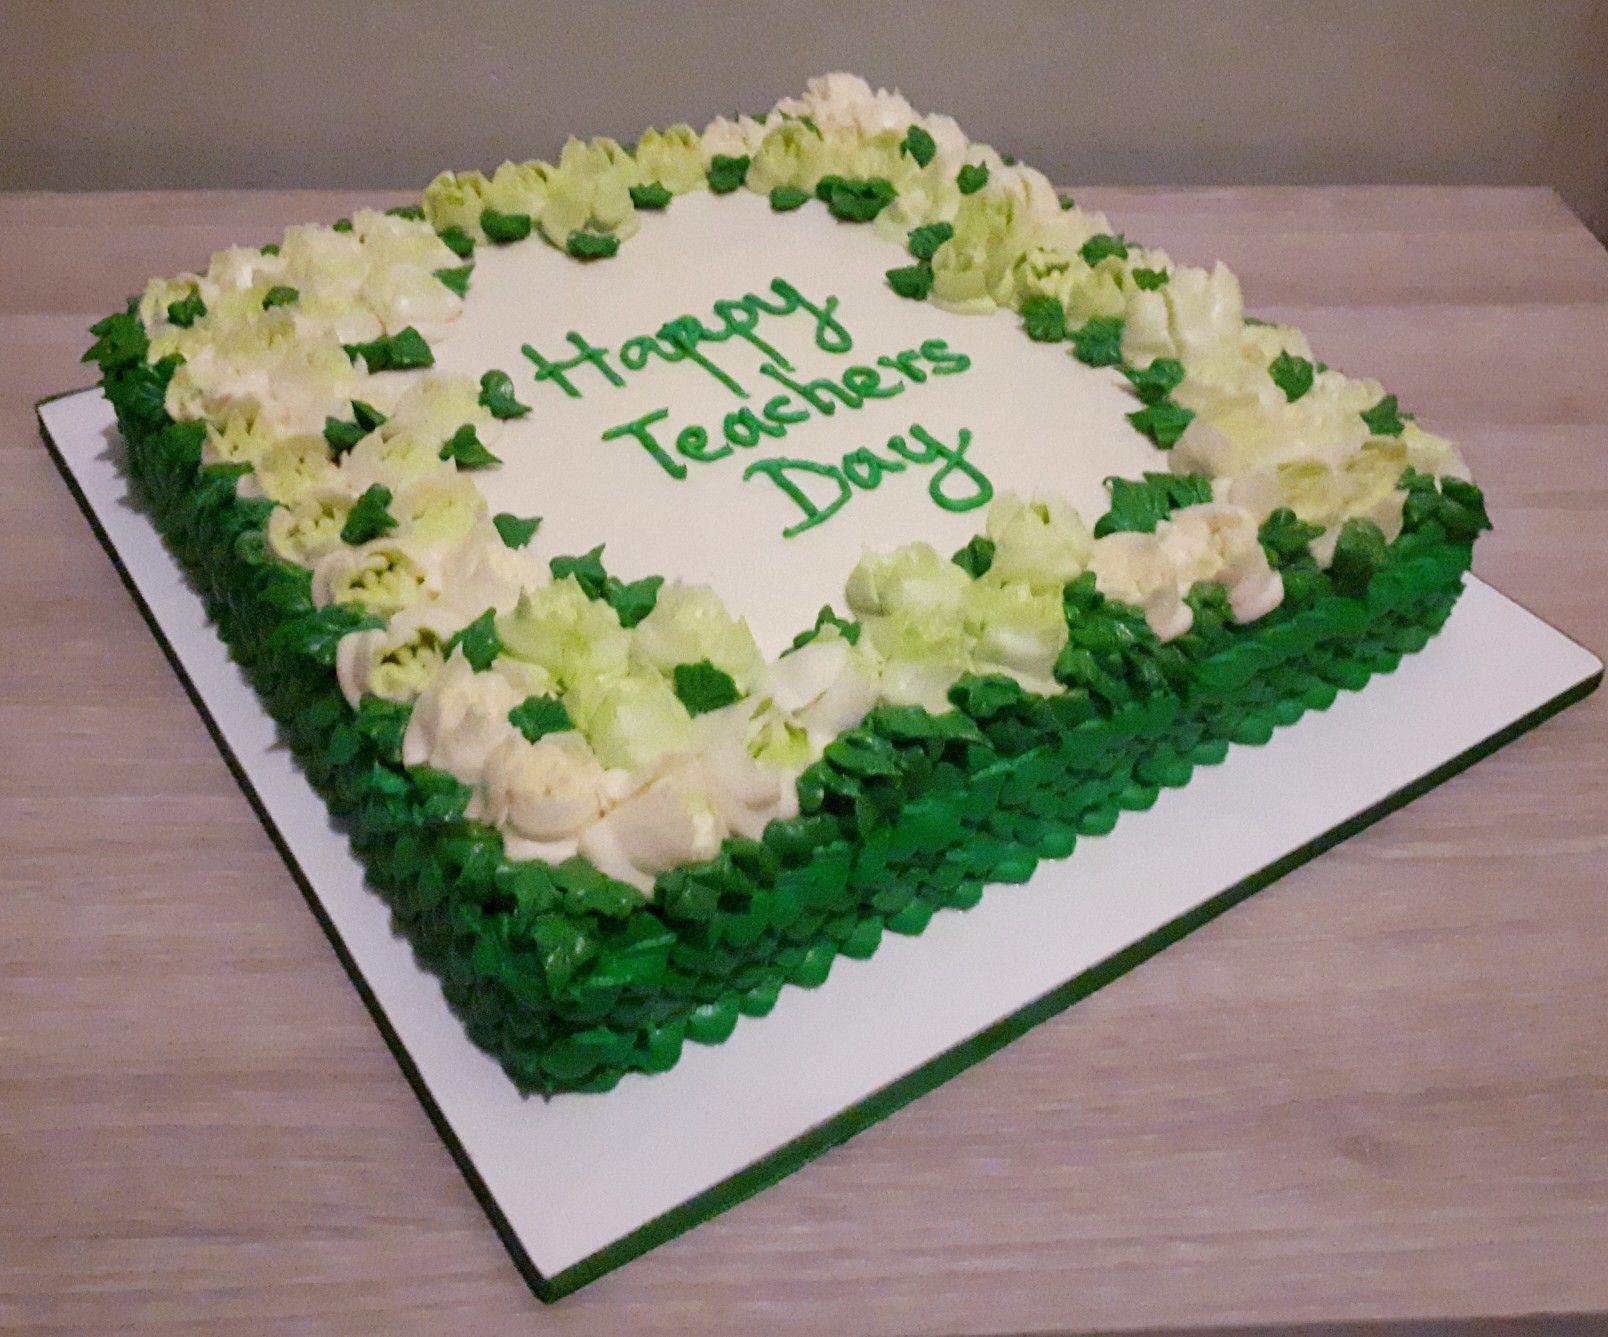 Floral Teacher S Day Cake Teachers Day Cake Cake Food